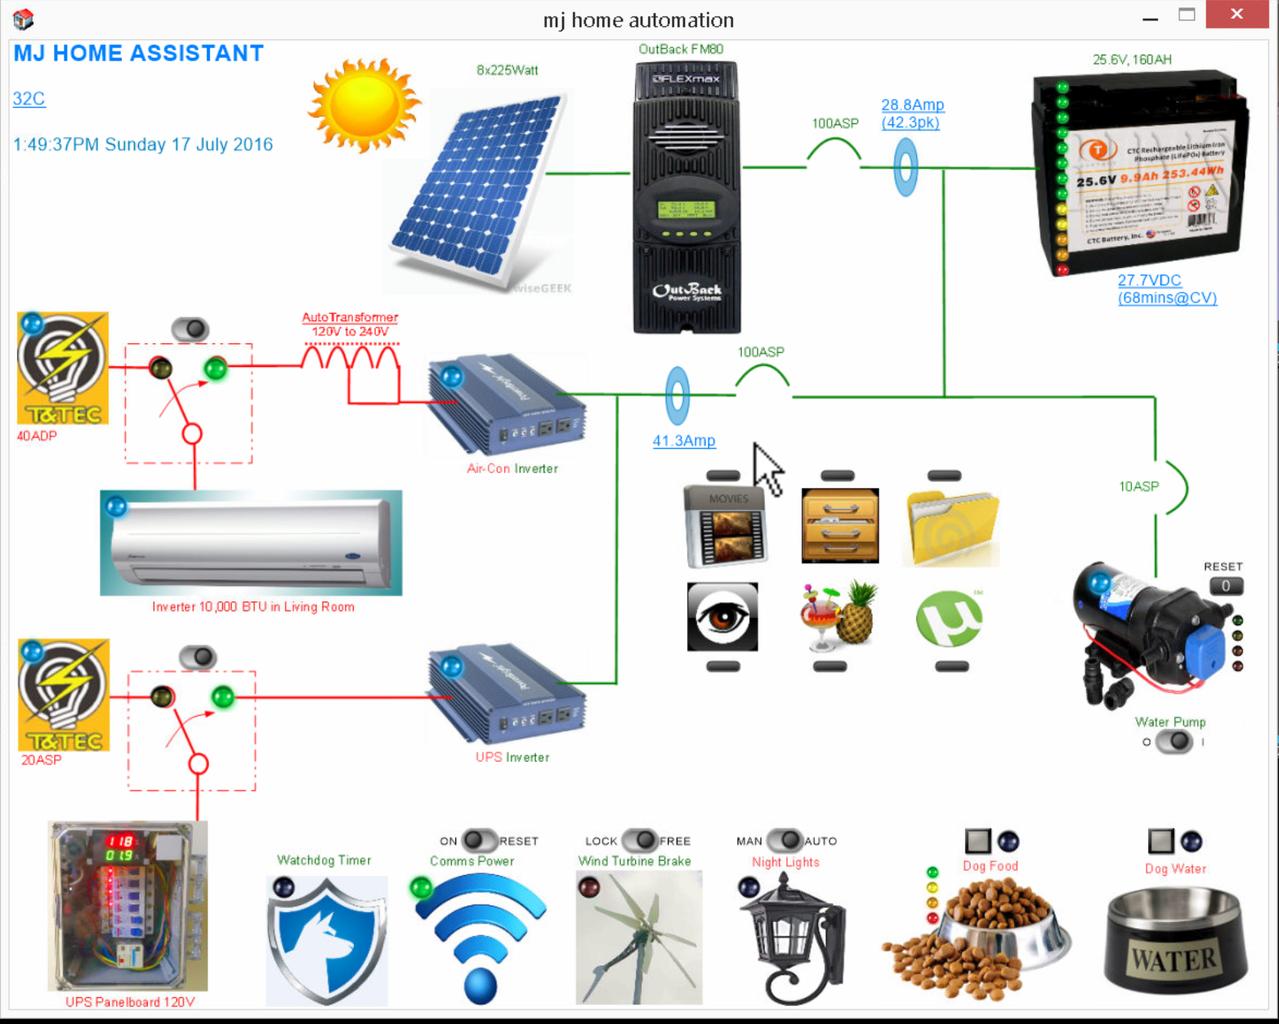 Enjoying Green Energy Air Conditioning!